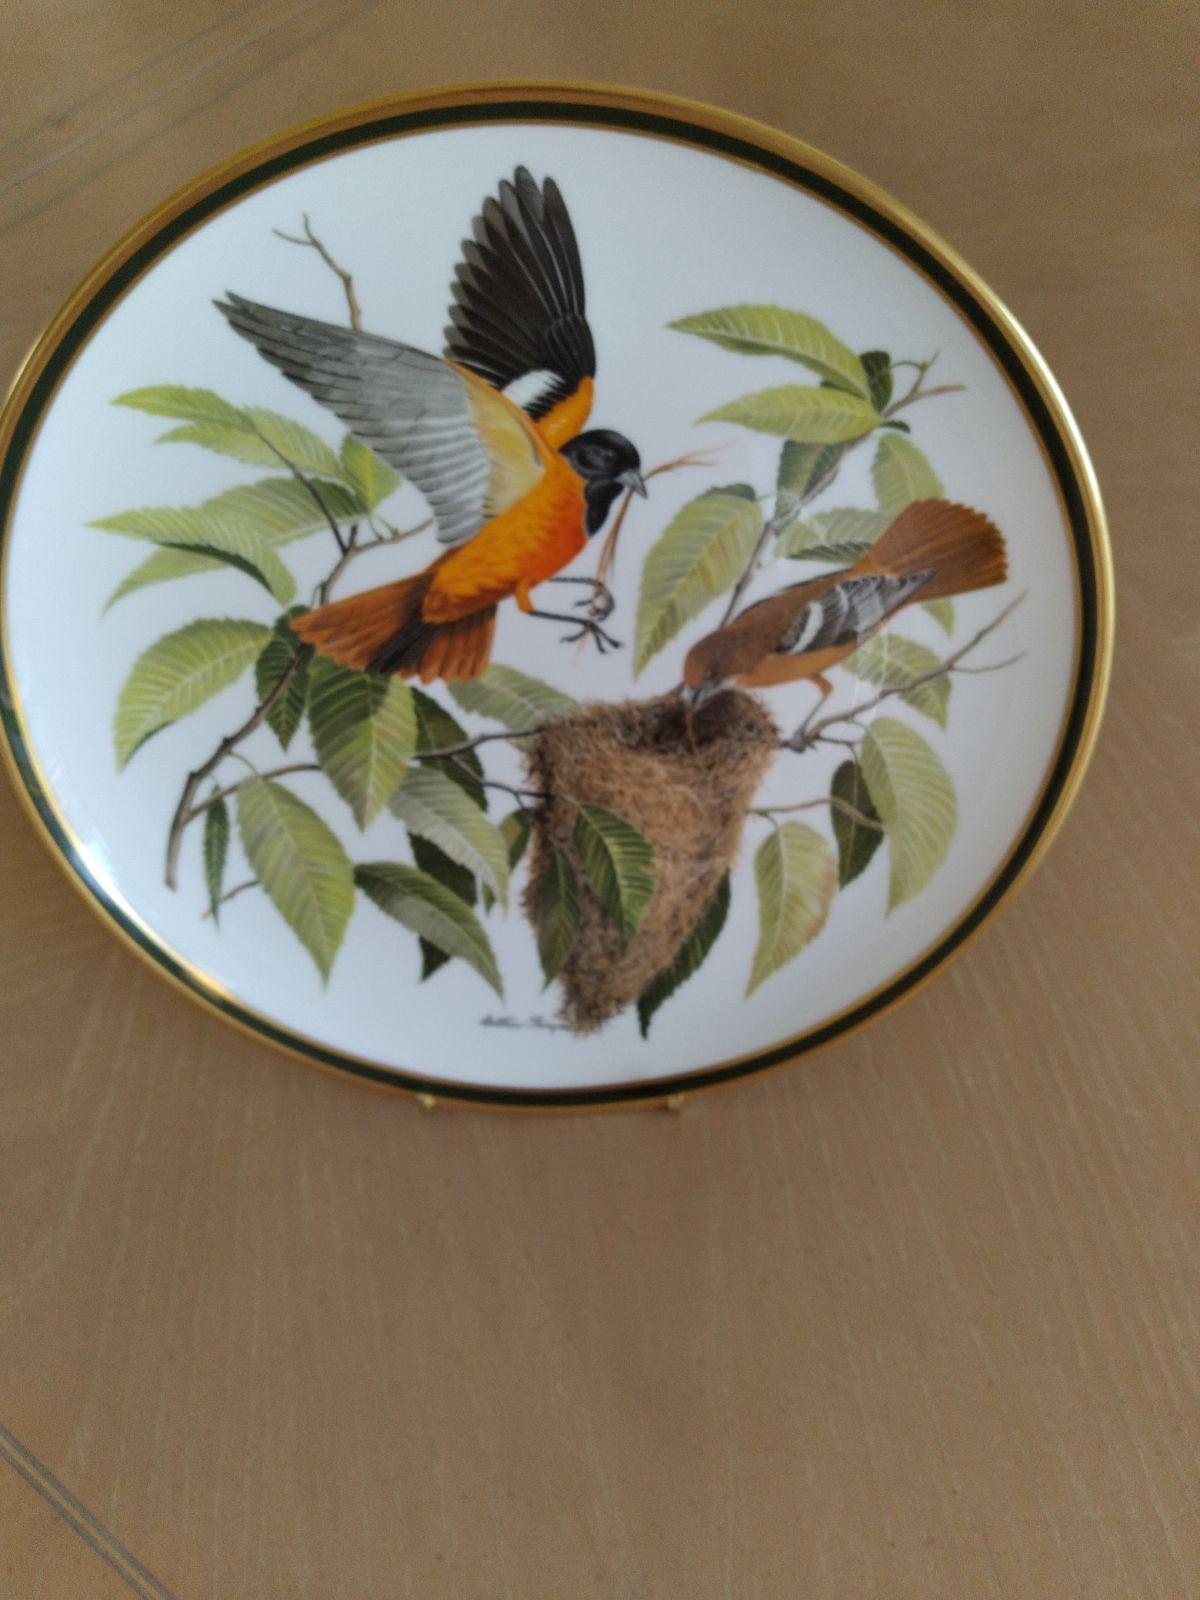 Audubon songbirds of America plate